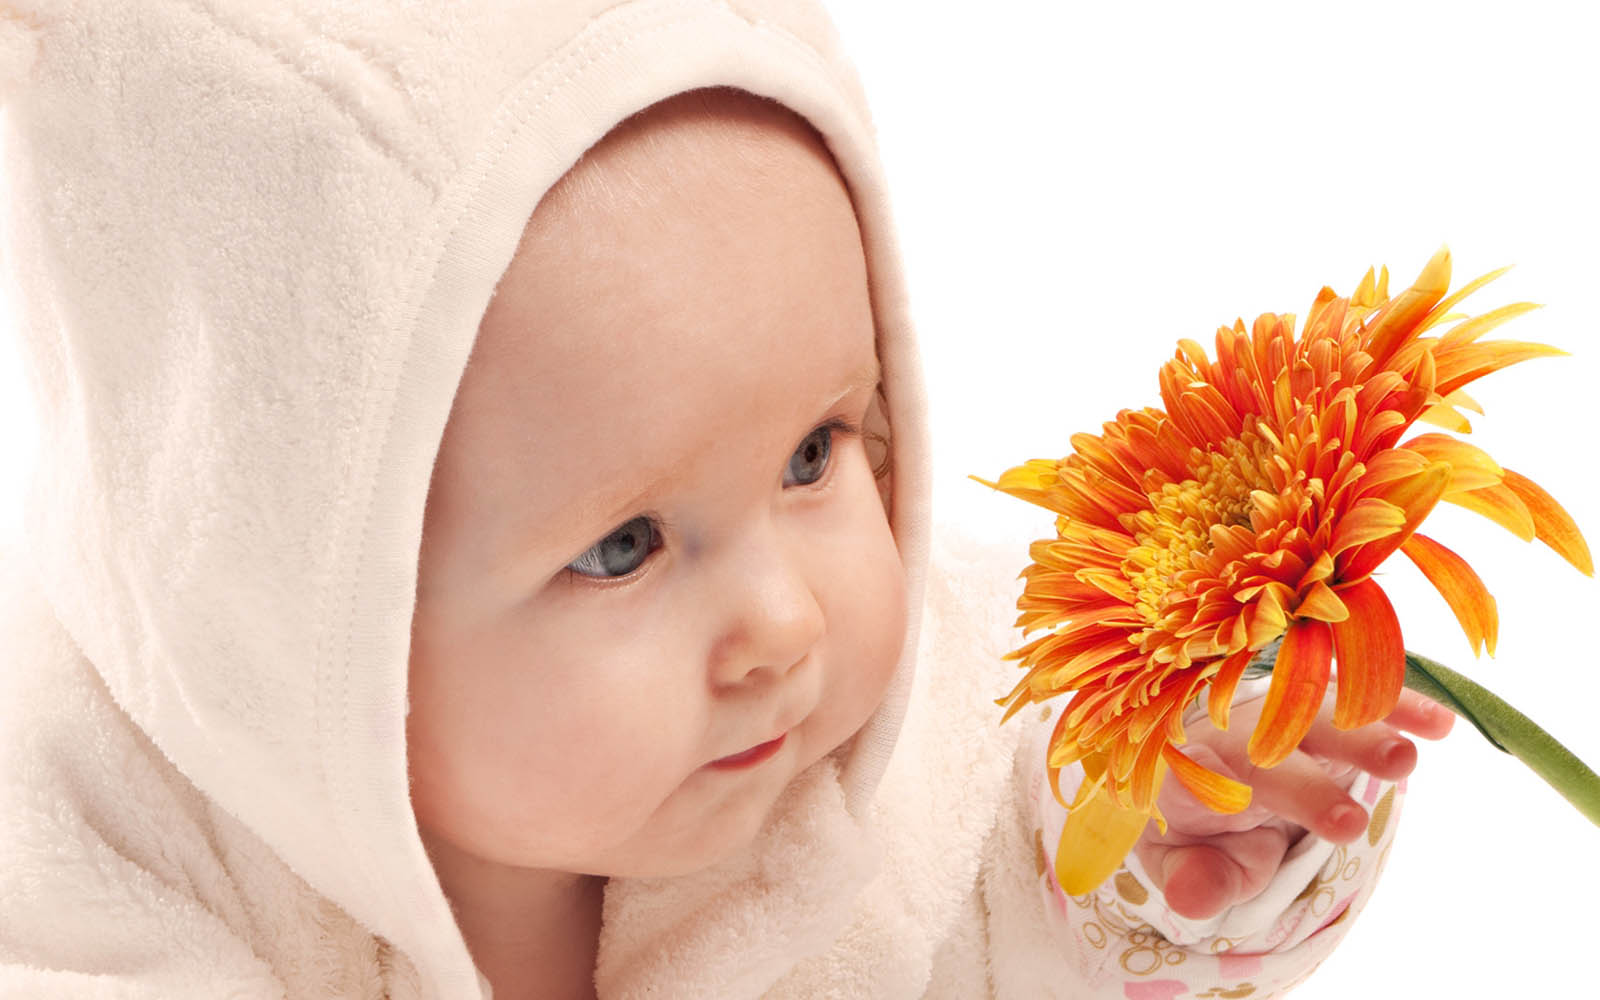 http://4.bp.blogspot.com/-05vvl0Z49X0/UOWh-iWfe0I/AAAAAAAAQiM/CgOSuu7CkAg/s1600/Innocent+Babies+Wallpapers+07.jpg